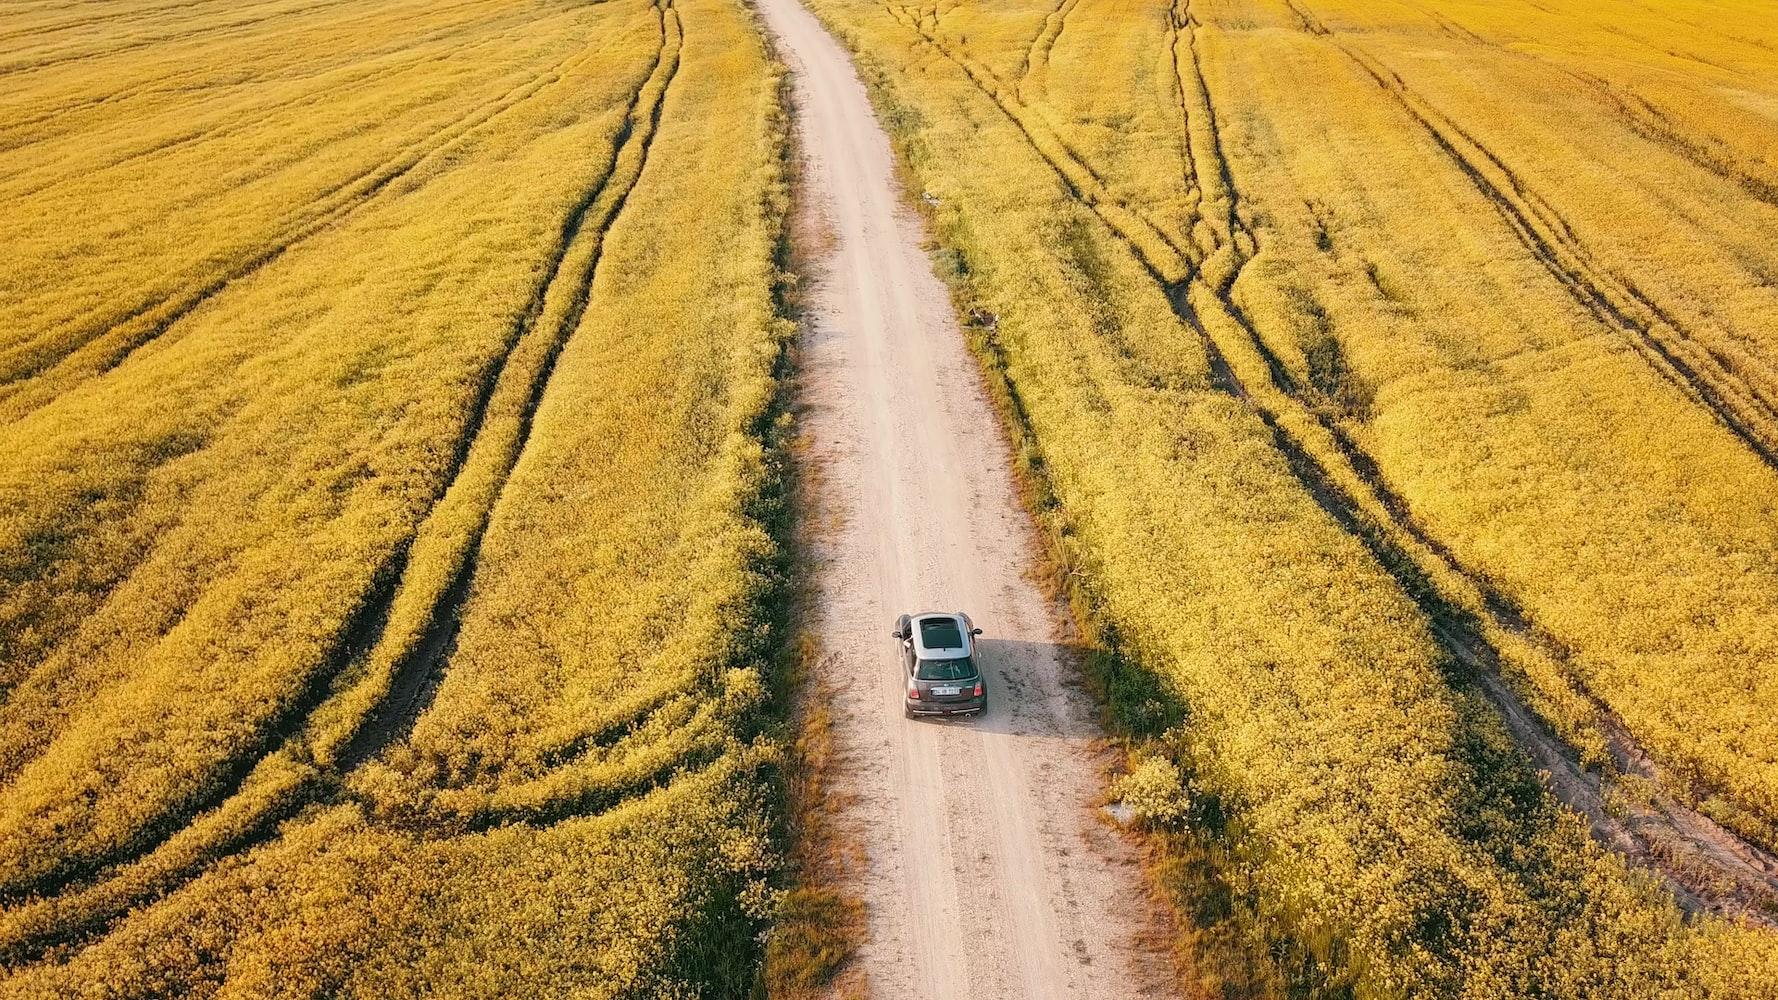 Grey Mini Cooper driving through a field